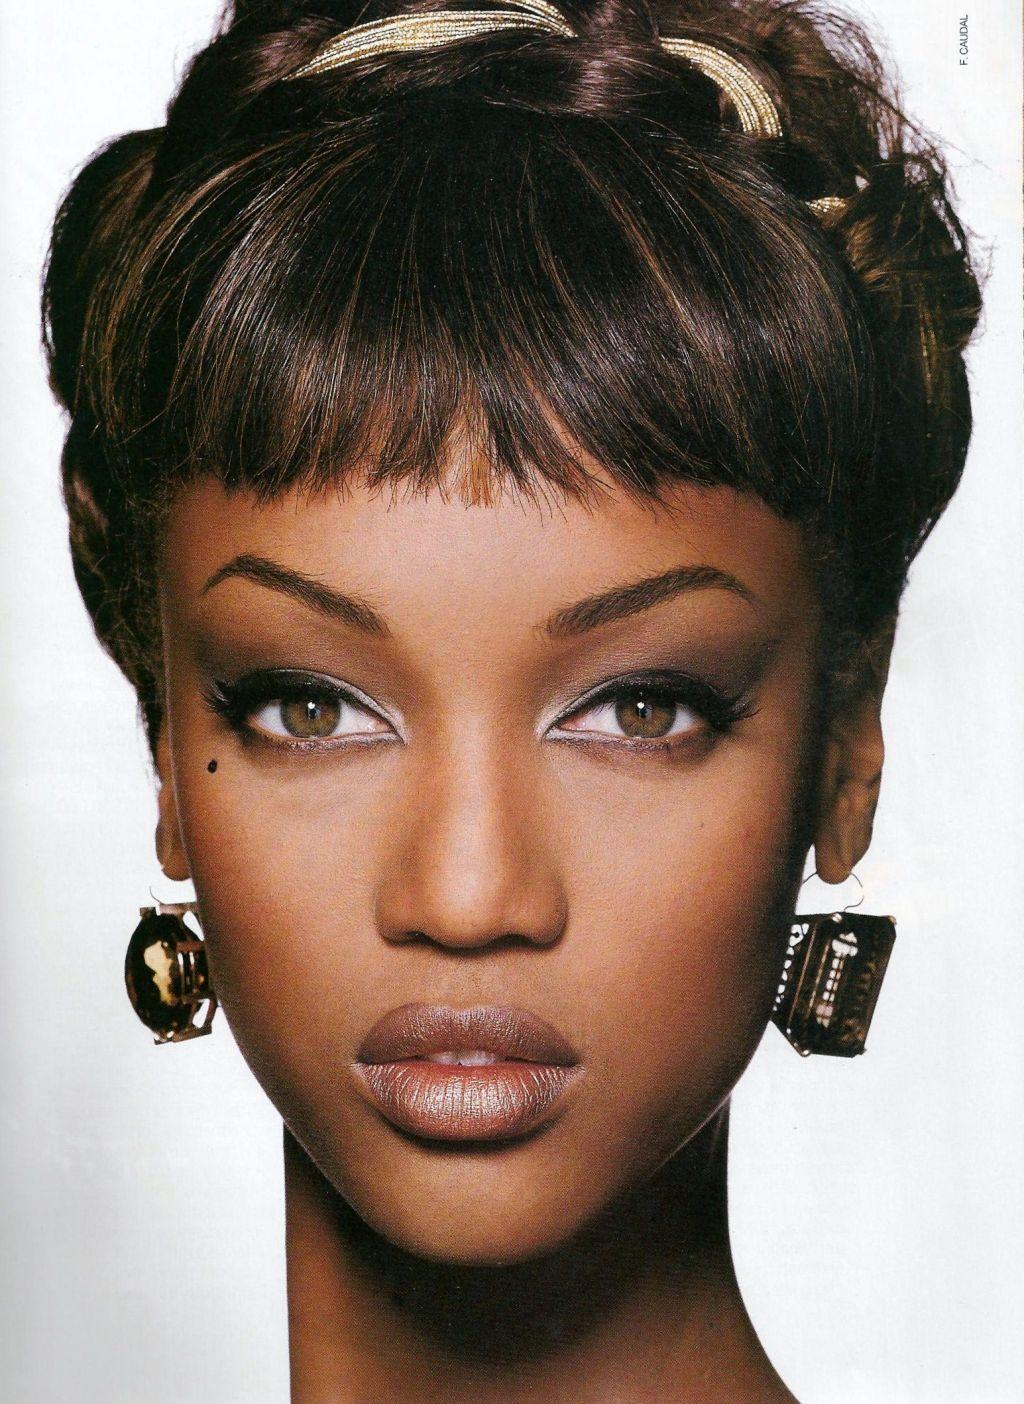 US ELLE December 1991 Model Tyra Banks Photographer F